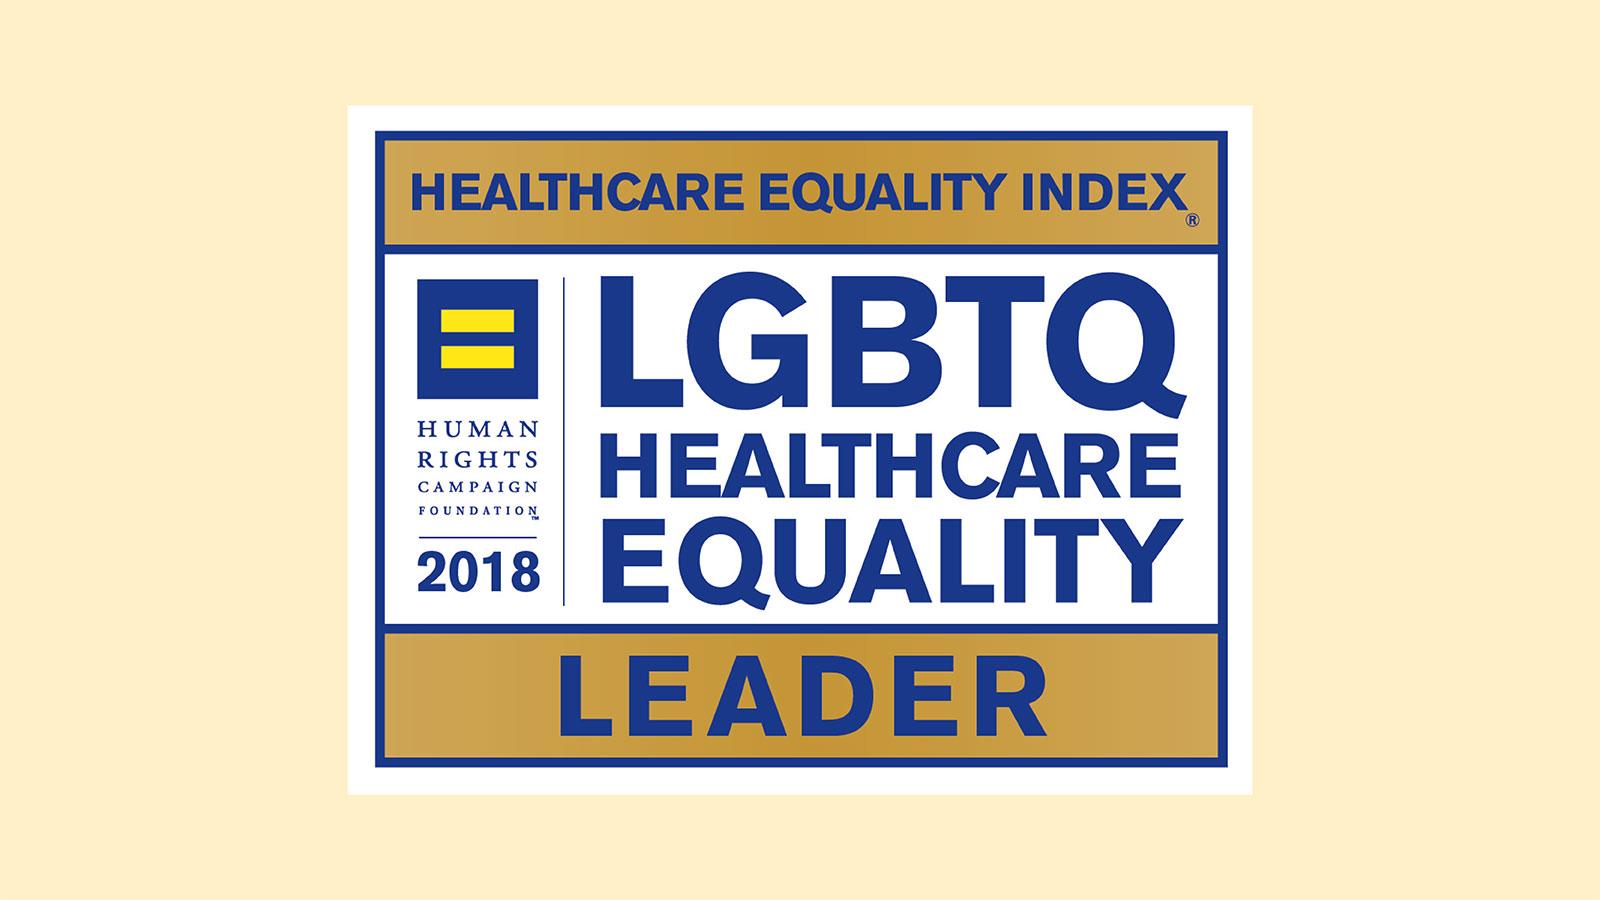 Health equality